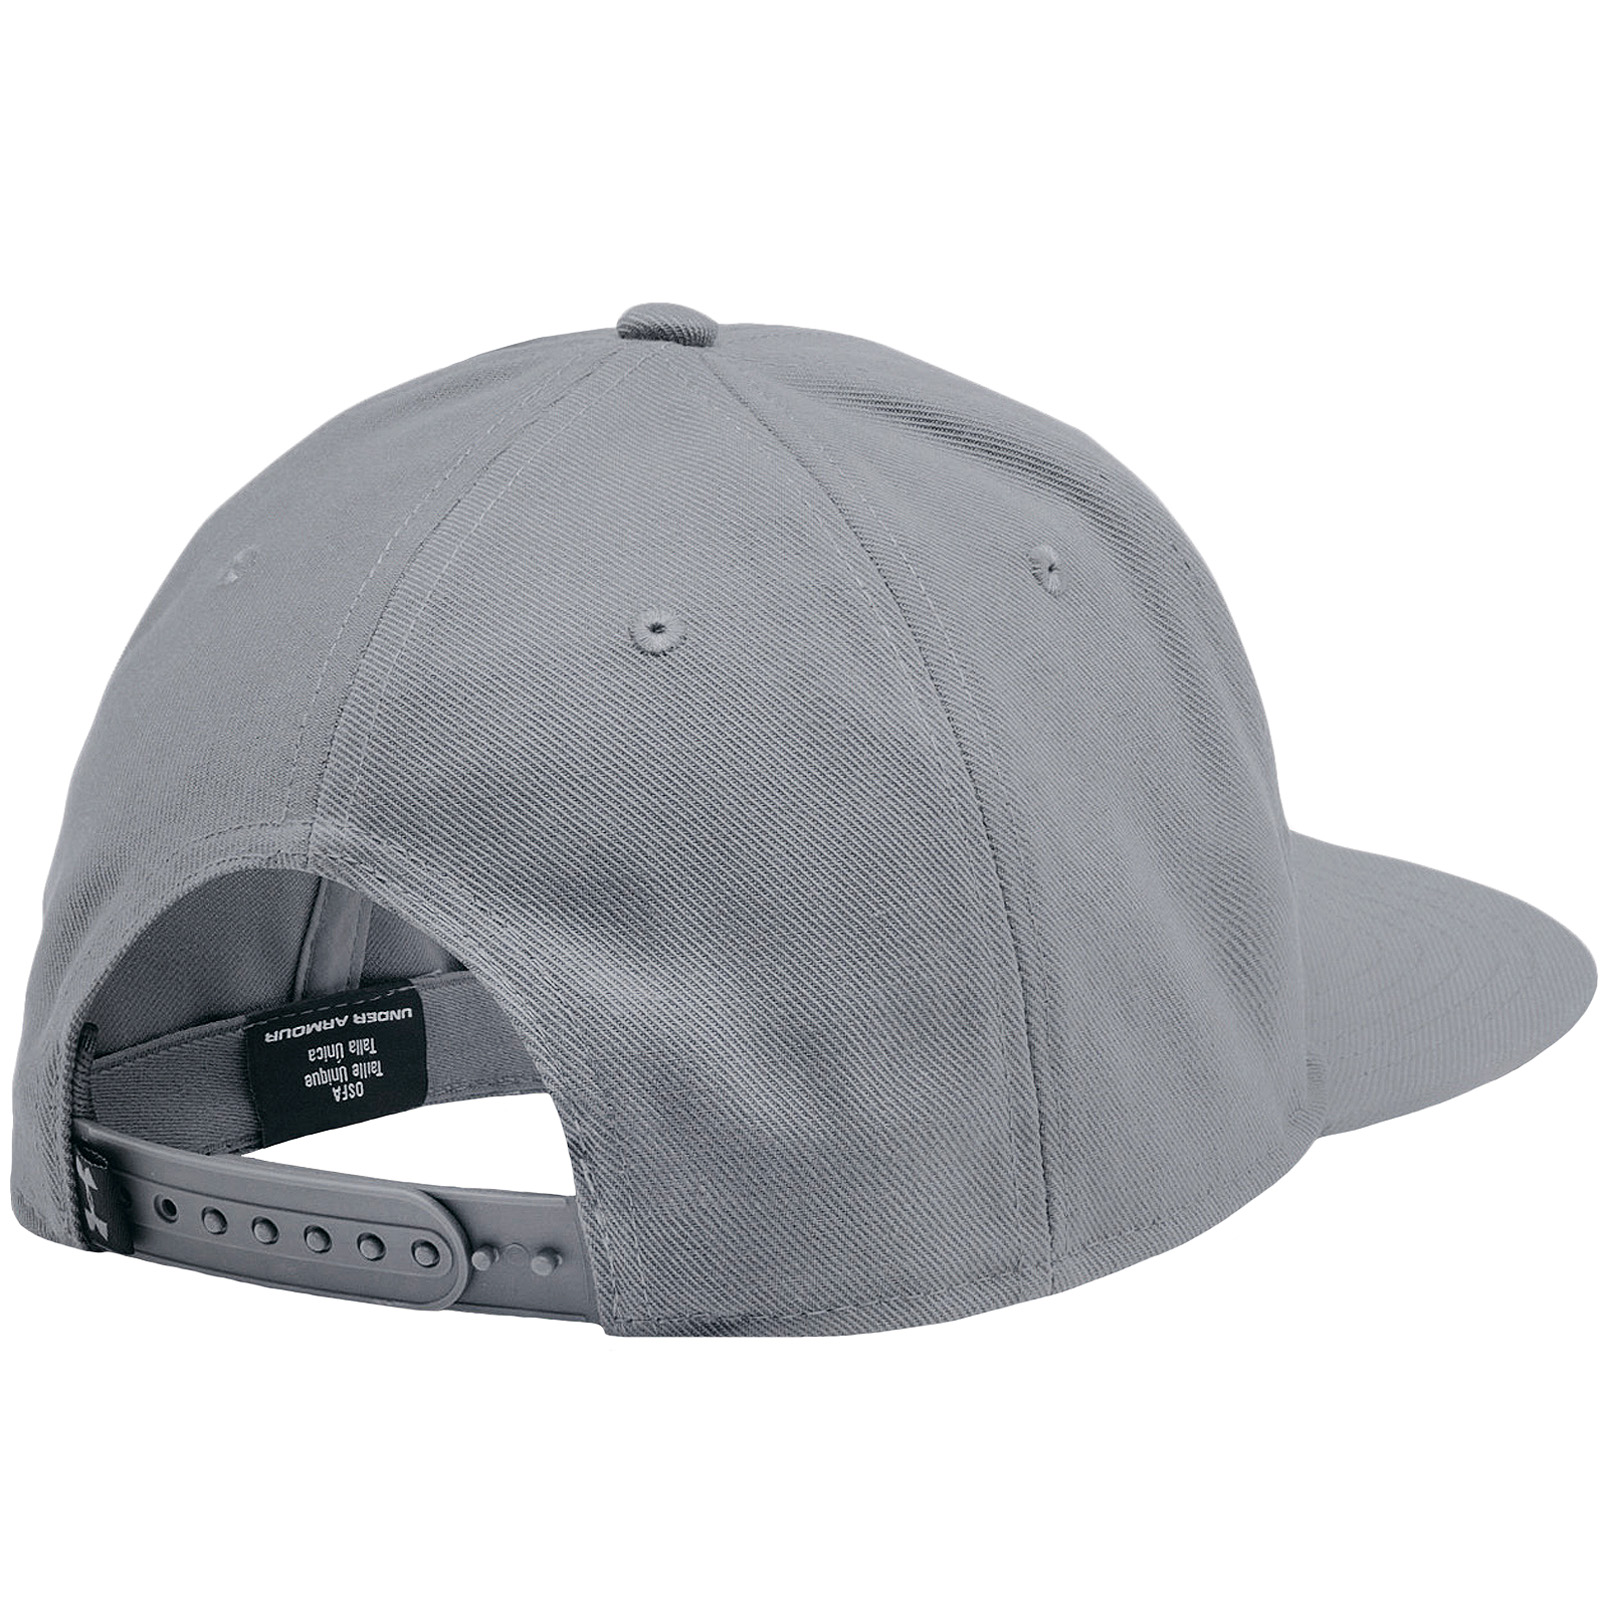 Under Armour Mens Huddle Snapback Adjustable Sports Active Baseball Cap Hat